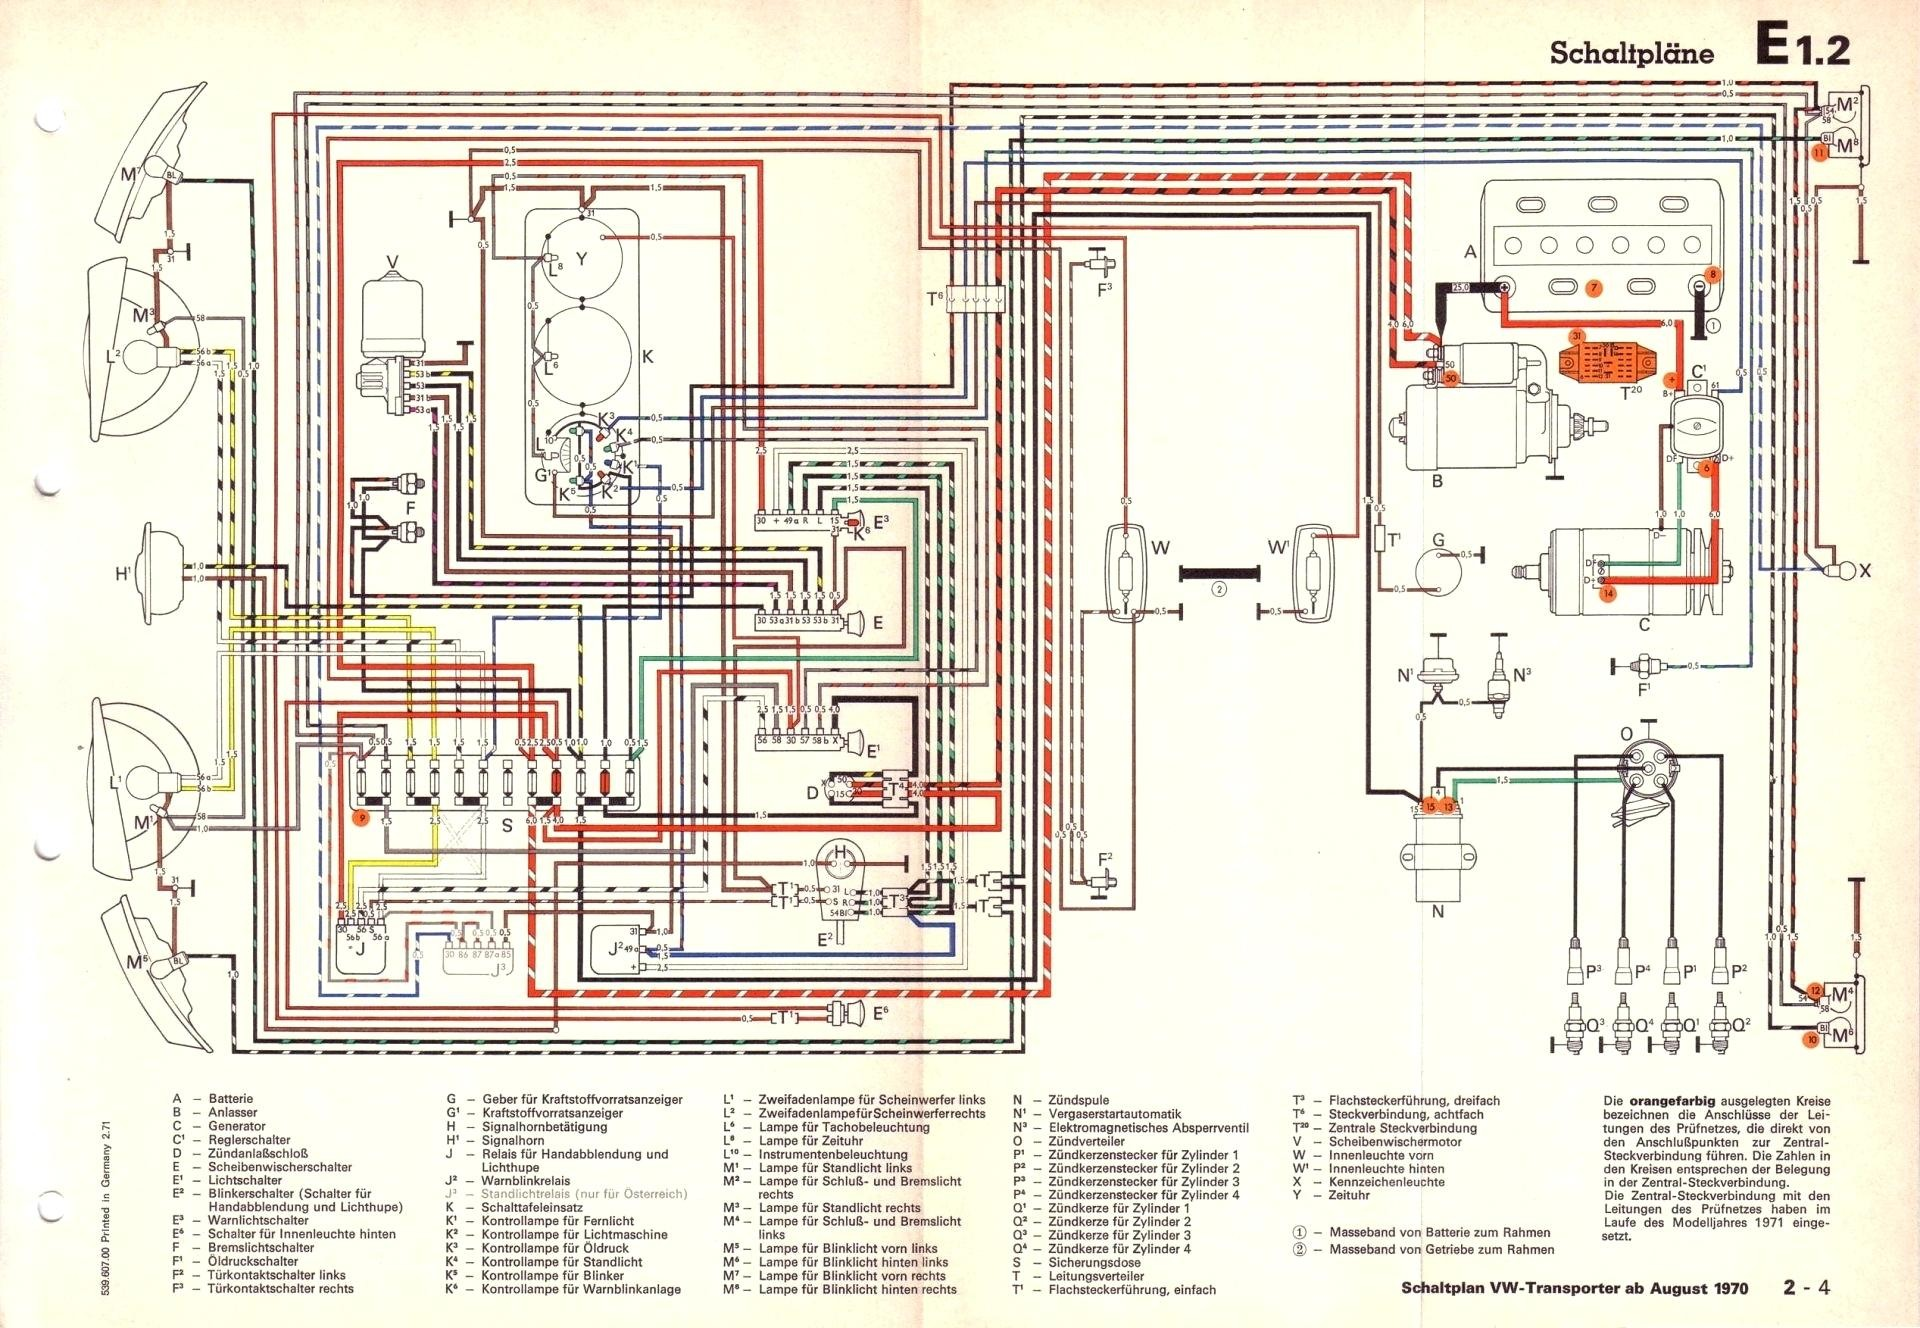 2001 Vw Beetle 2 0 Engine Diagram 1974 Bug Wiring Page 74 Diagrams A